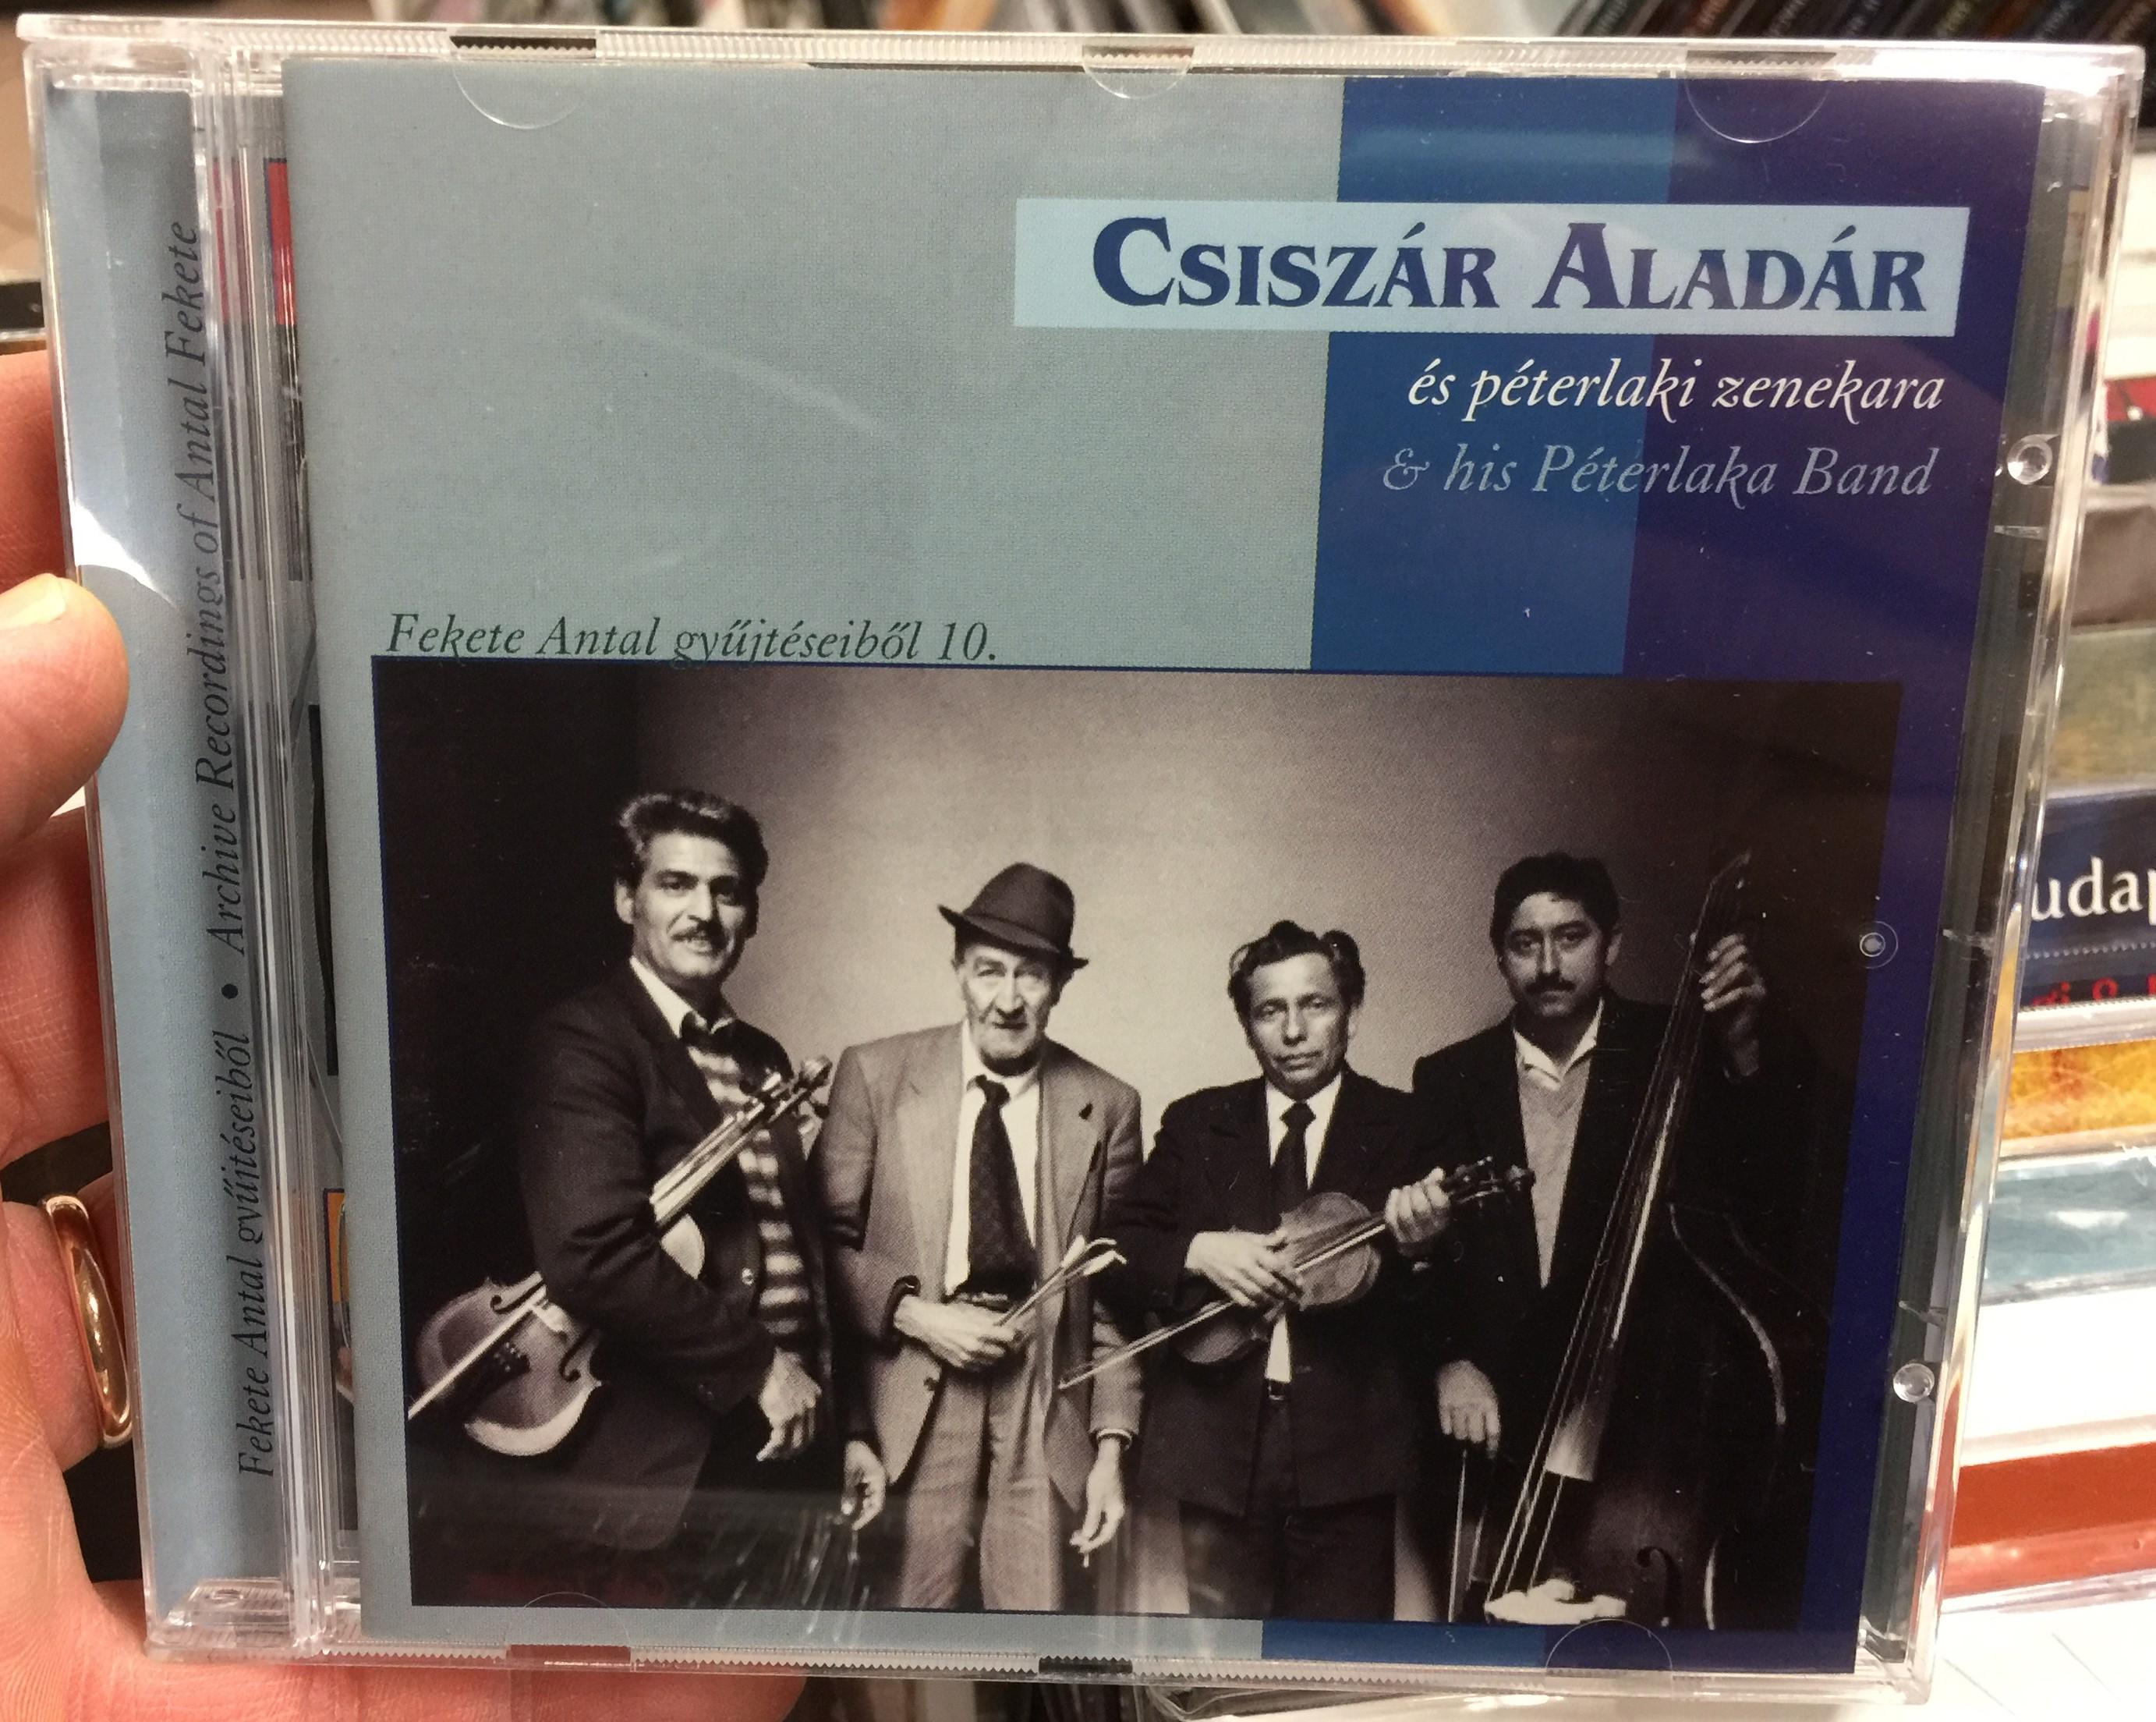 csisz-r-alad-r-es-peterlaki-zenekara-his-peterlaka-band-fekete-antal-gyujteseibol-10.-folk-europa-audio-cd-2009-5999548112175-1-.jpg